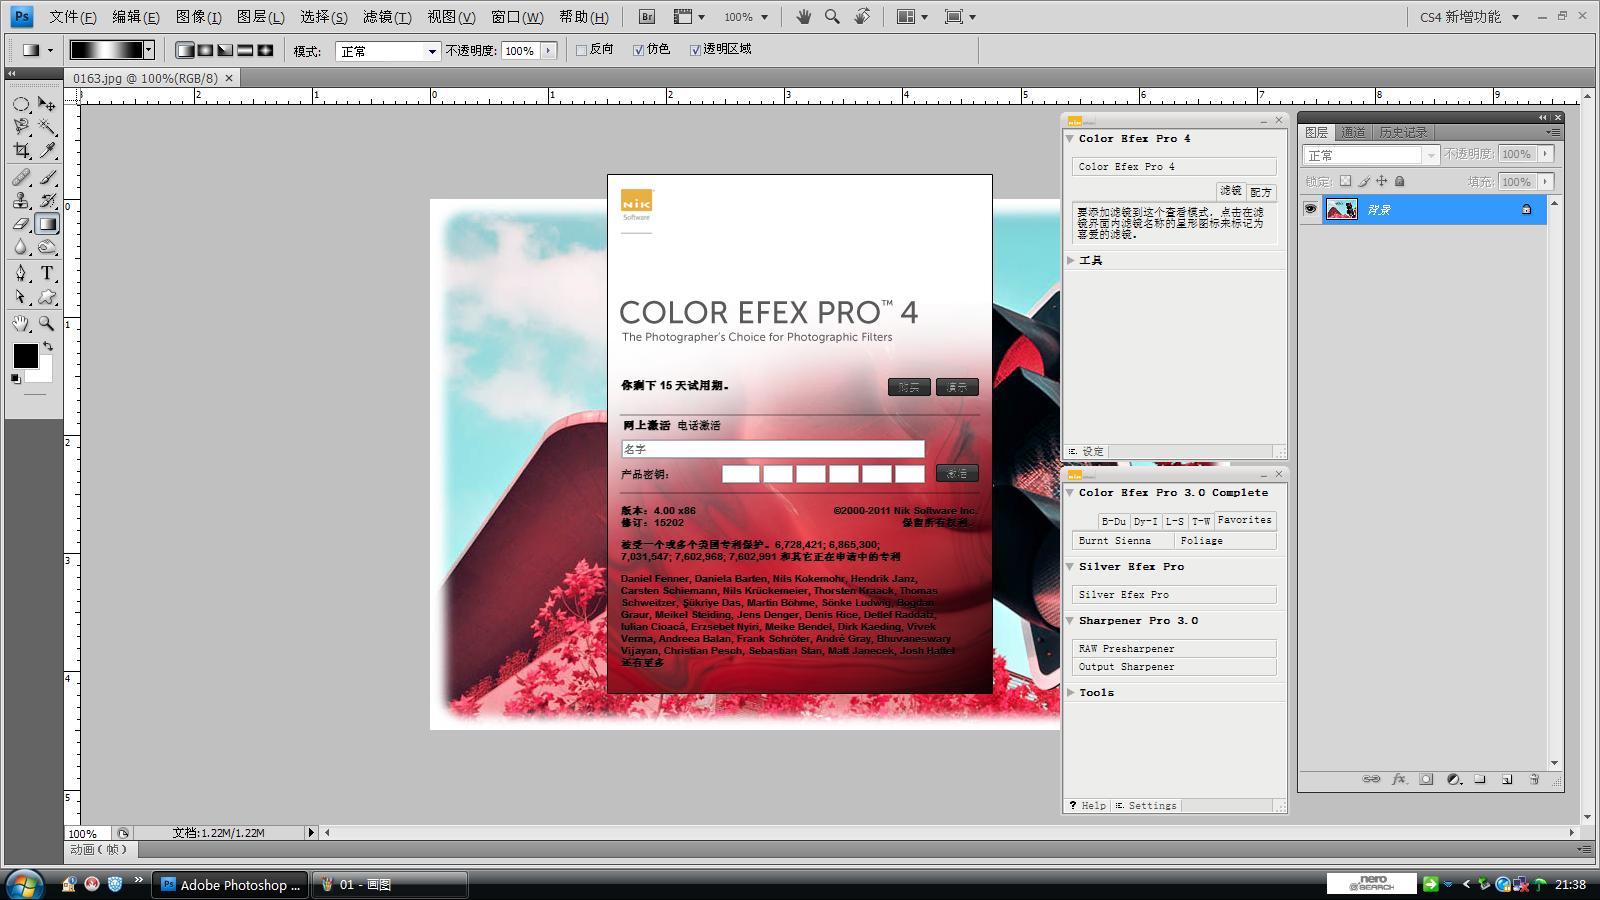 color efex pro 5 color efex pro color efex pro 4 color efex pro 5 mac nik color efex pro. Black Bedroom Furniture Sets. Home Design Ideas